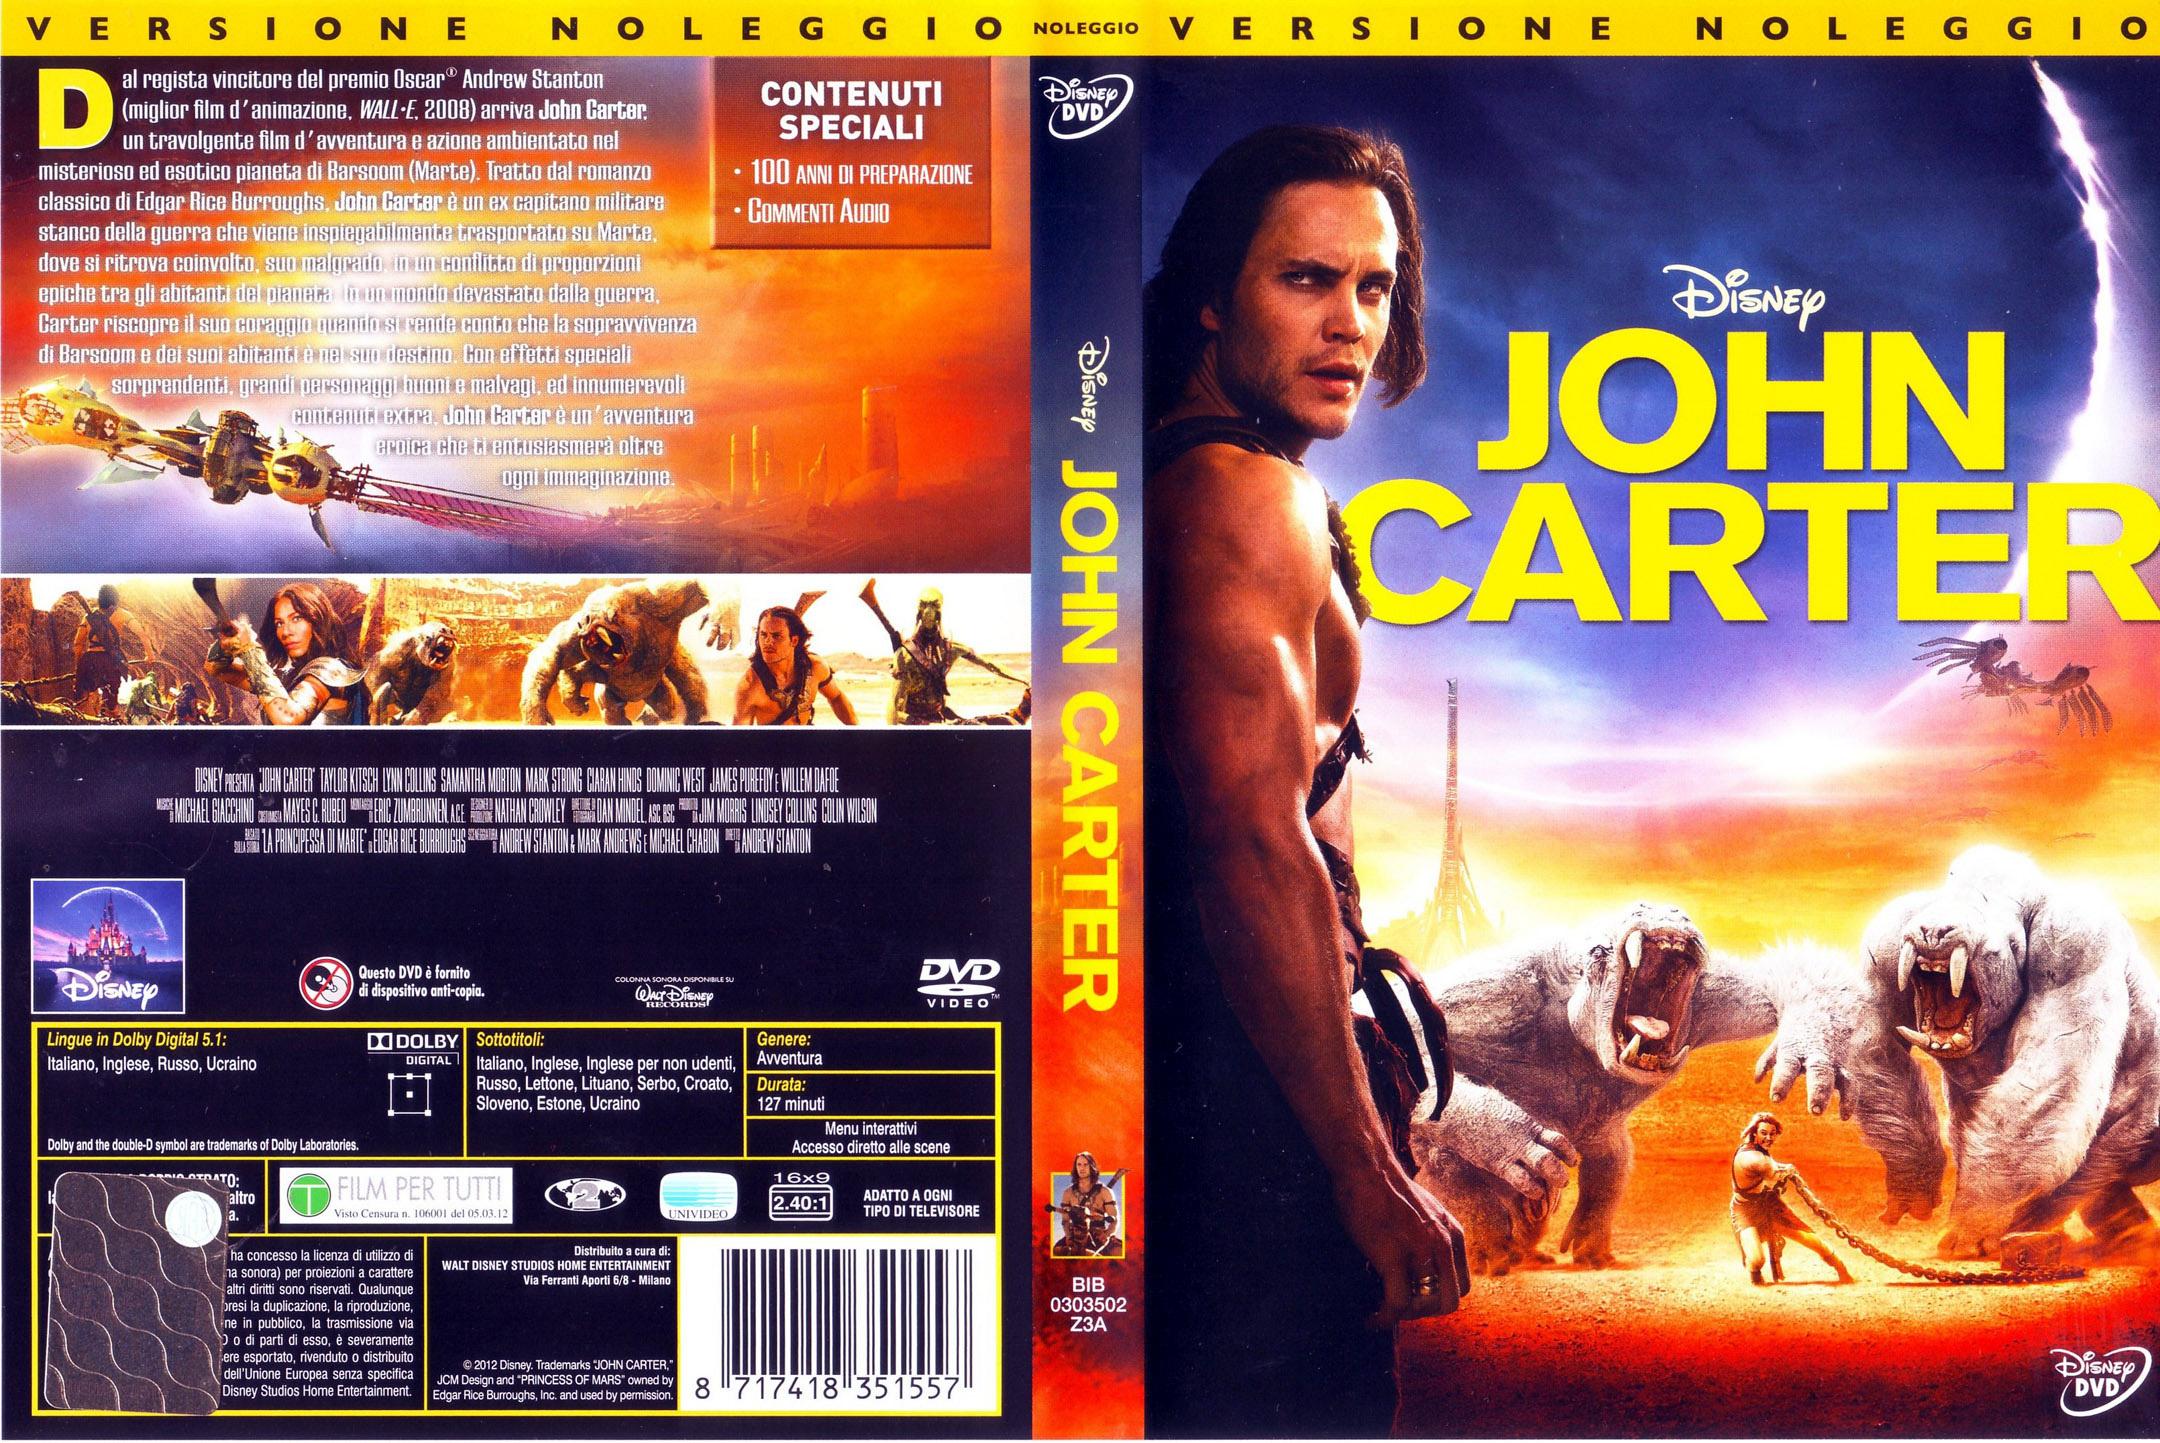 Covers Box Sk John Carter 2012 High Quality Dvd Blueray Movie